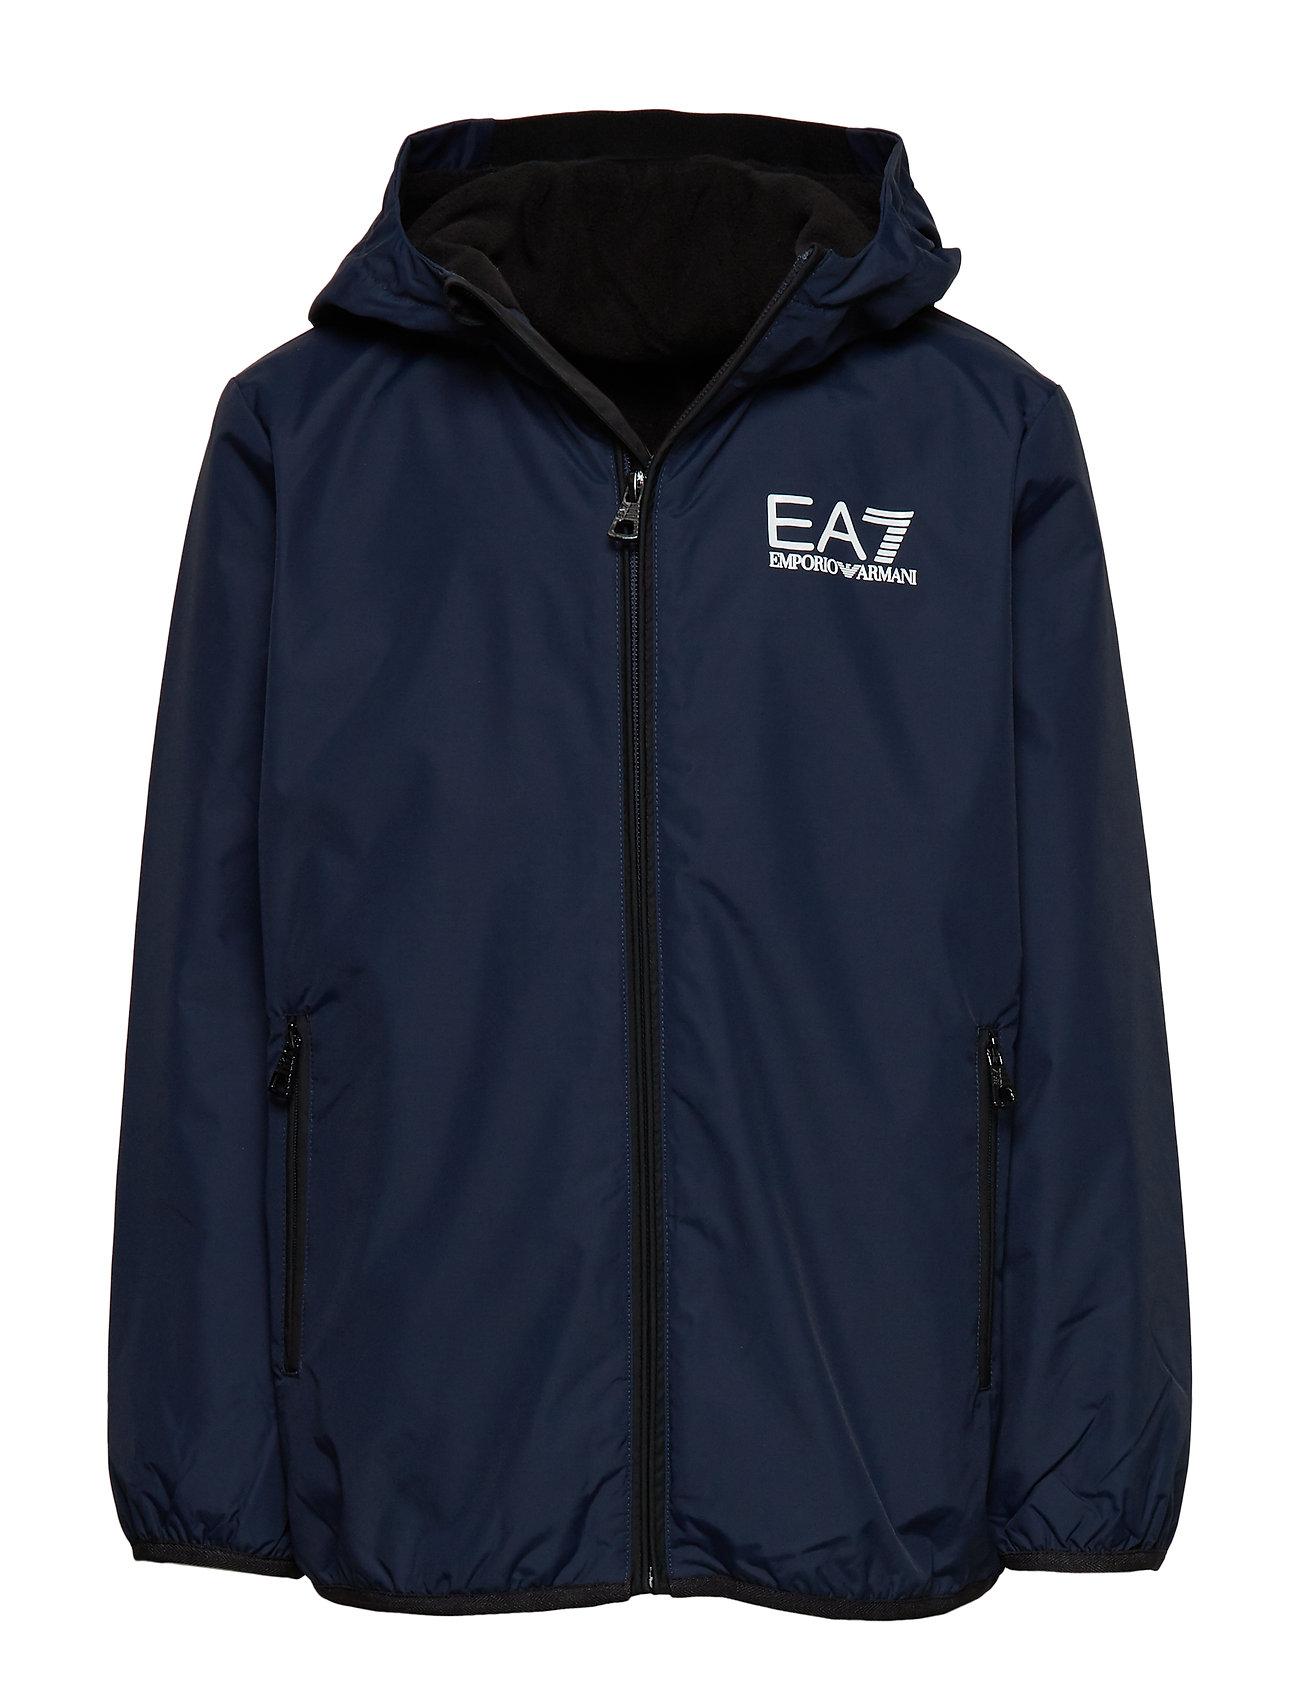 EA7 JACKETS - NAVY BLUE